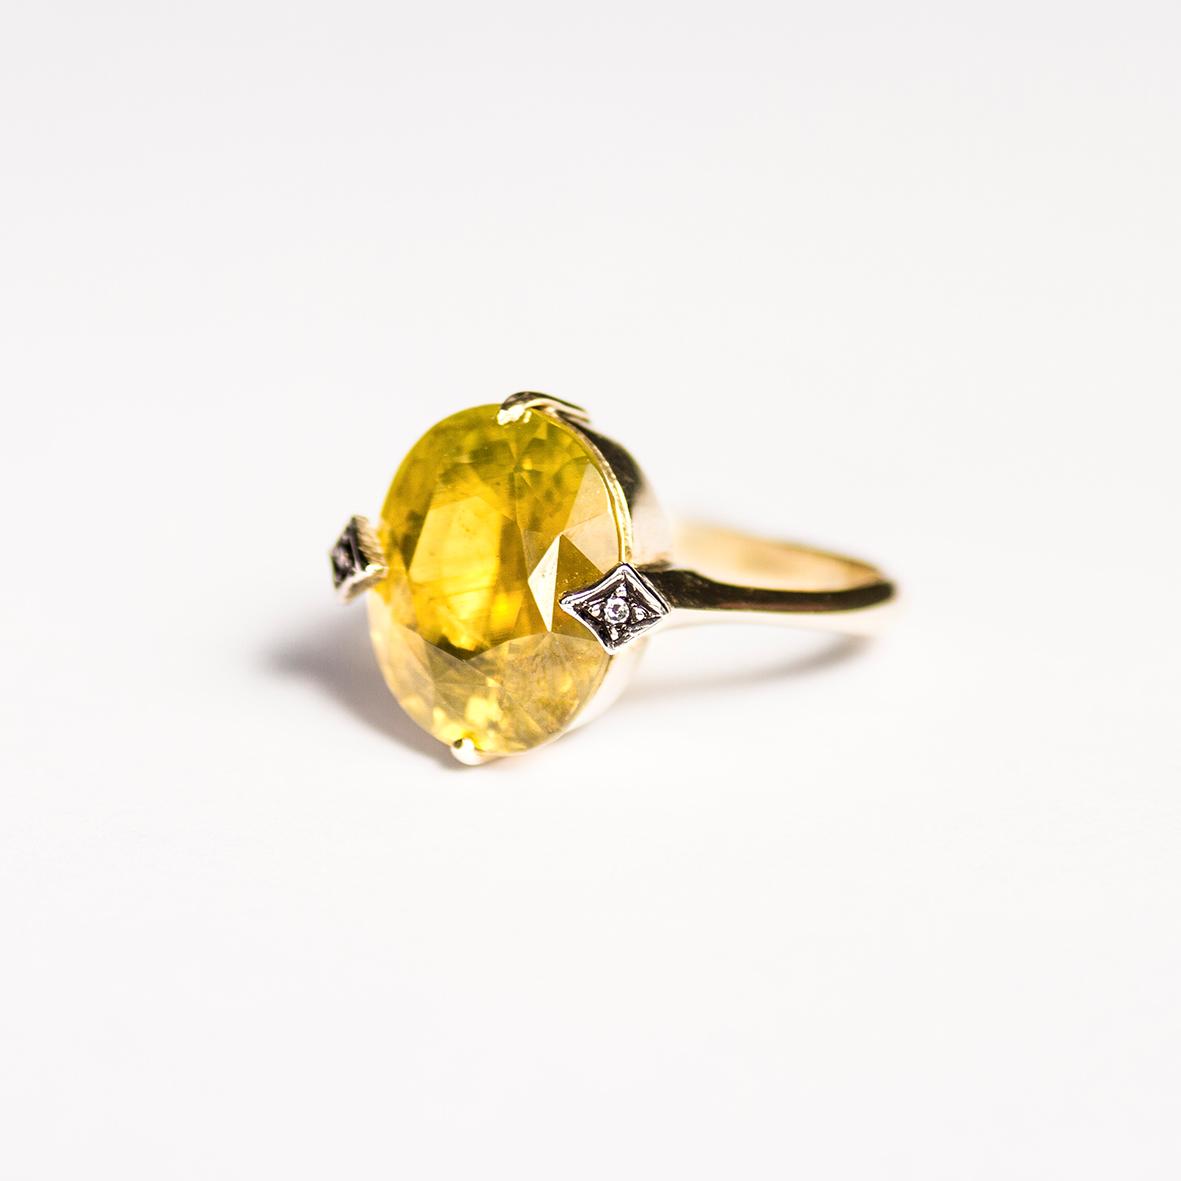 2. OONA_gems of ceylon_principal_yellow tourmaline ring